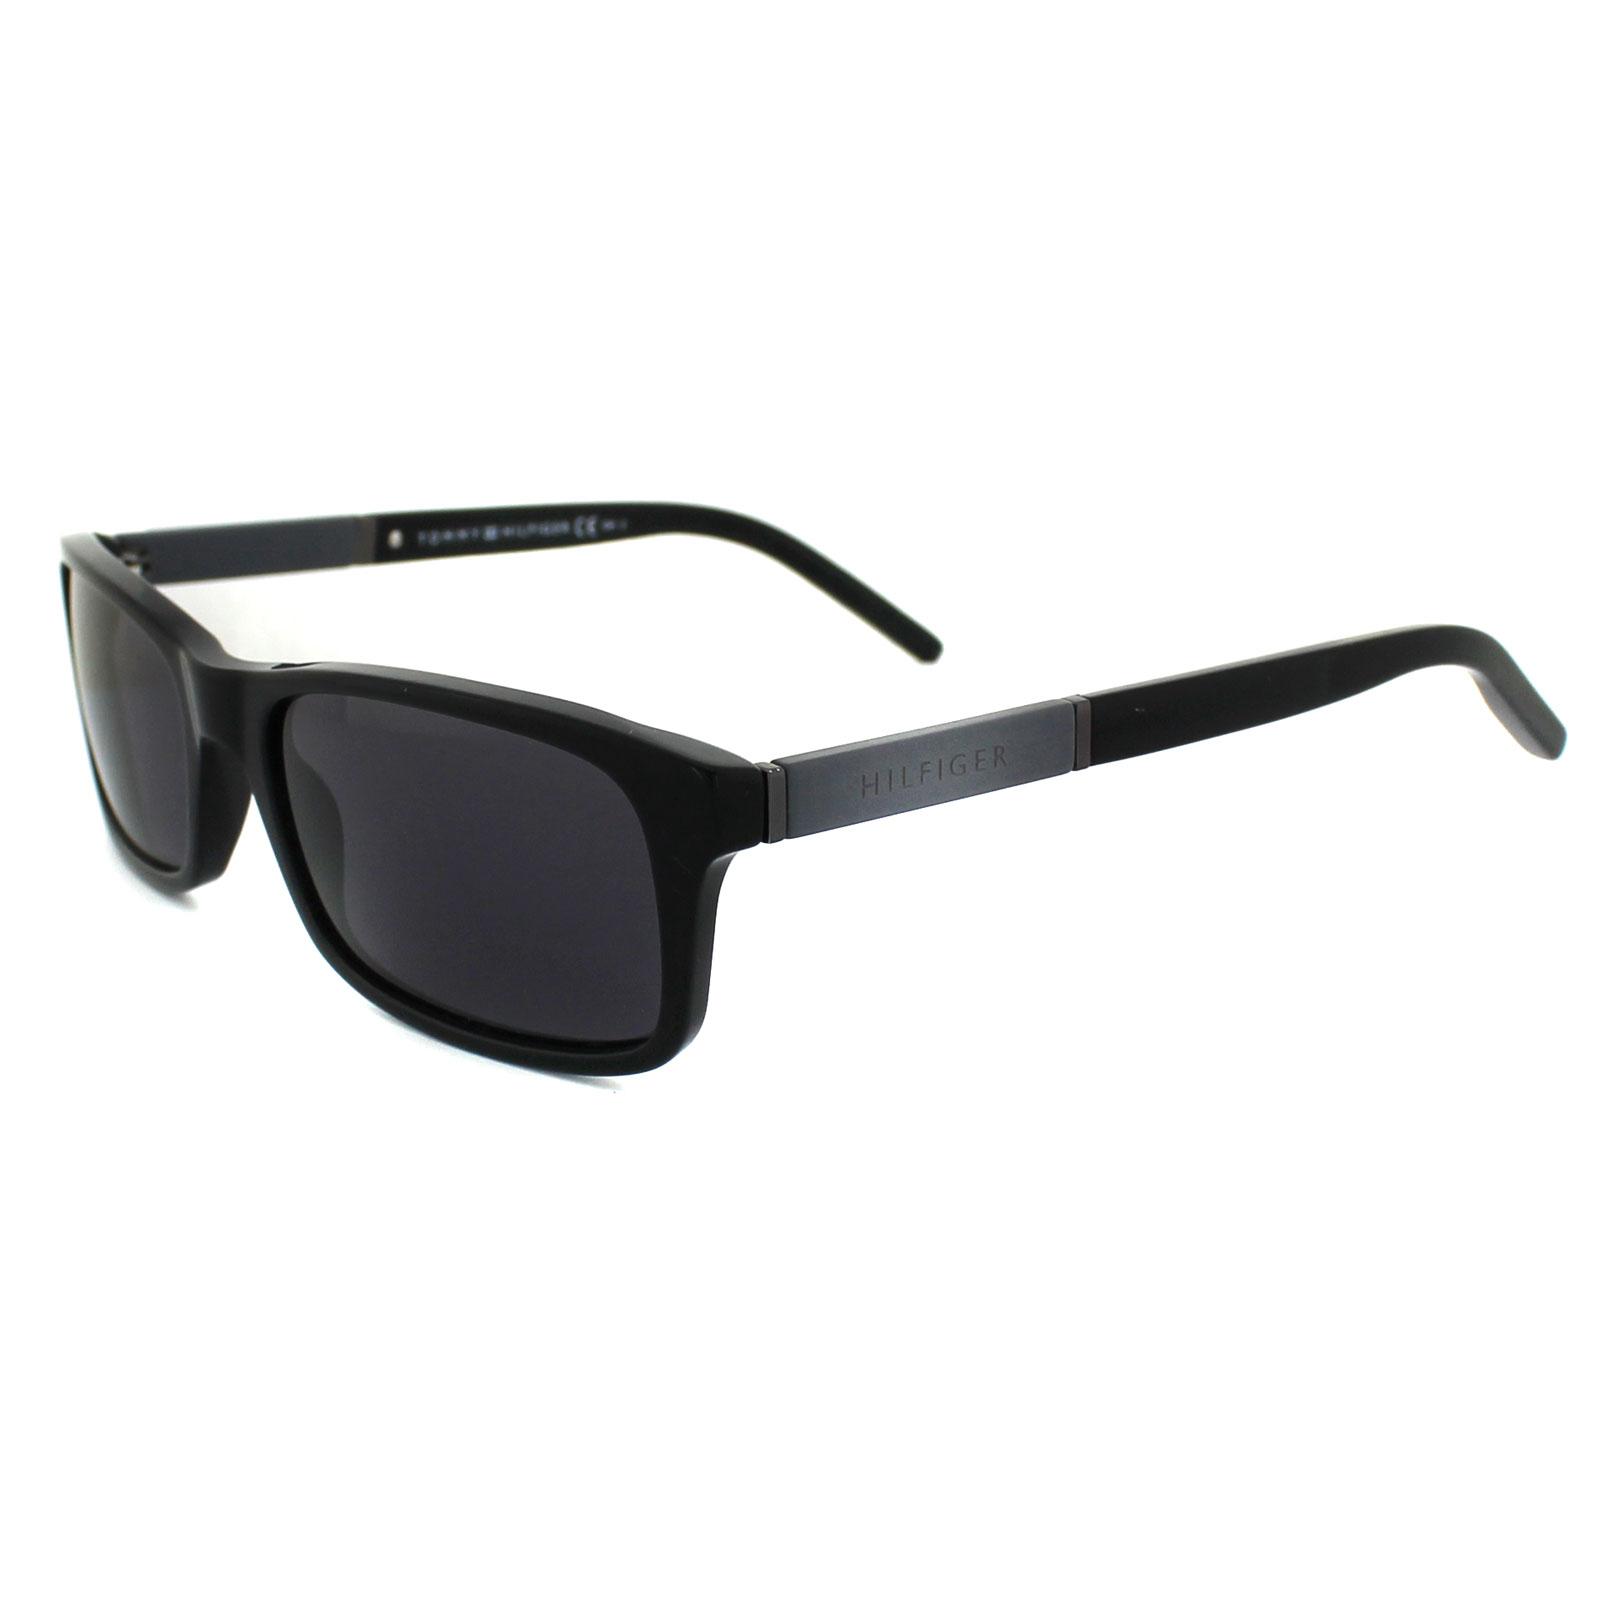 6e201cfcd480 Ebay Oakley Sunglasses Mens « One More Soul